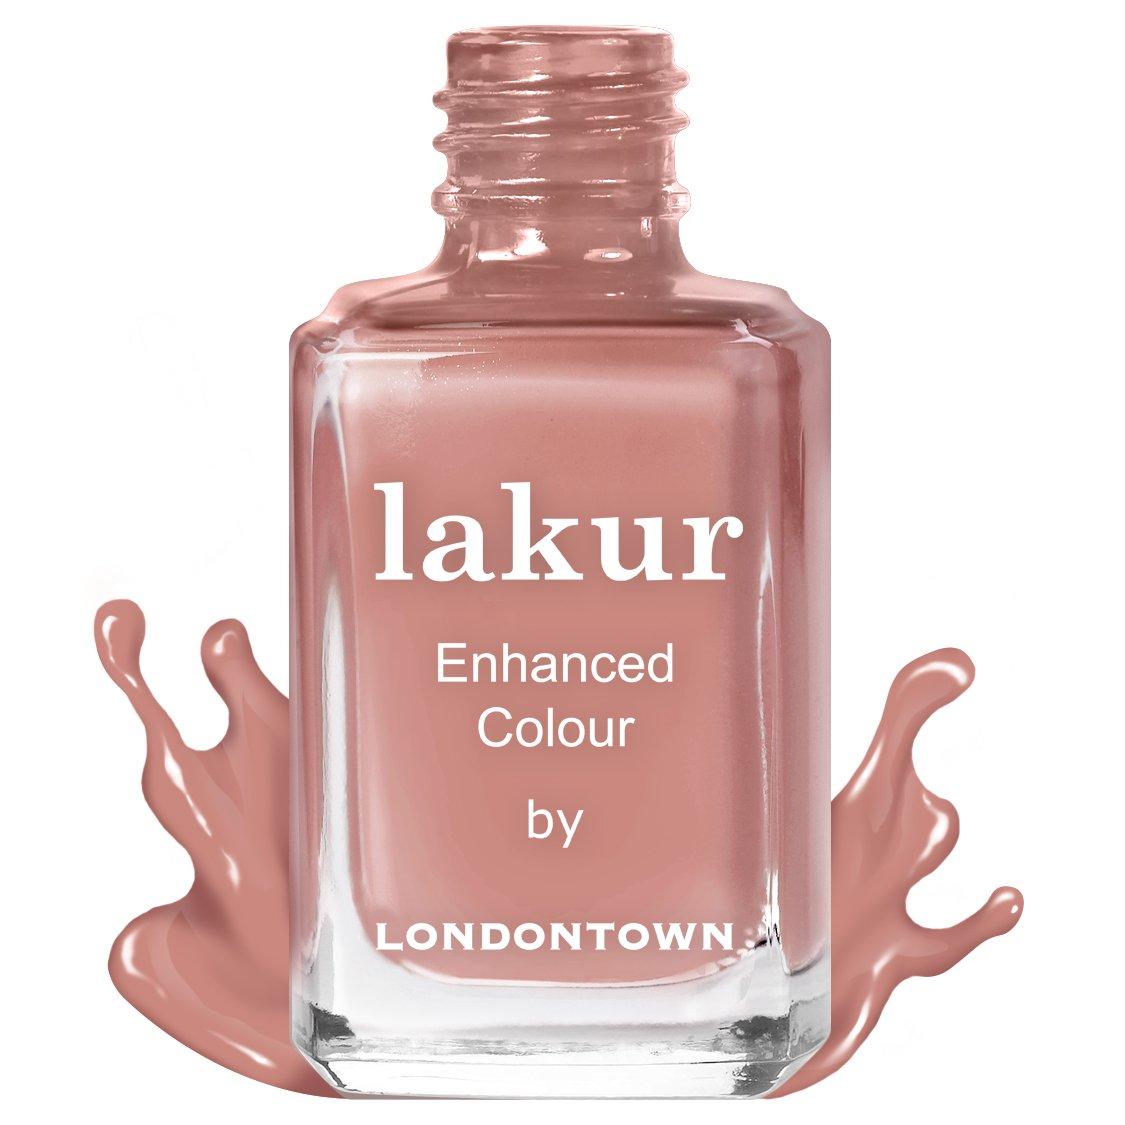 LONDONTOWN Lakur Nail Polish Mauve Over